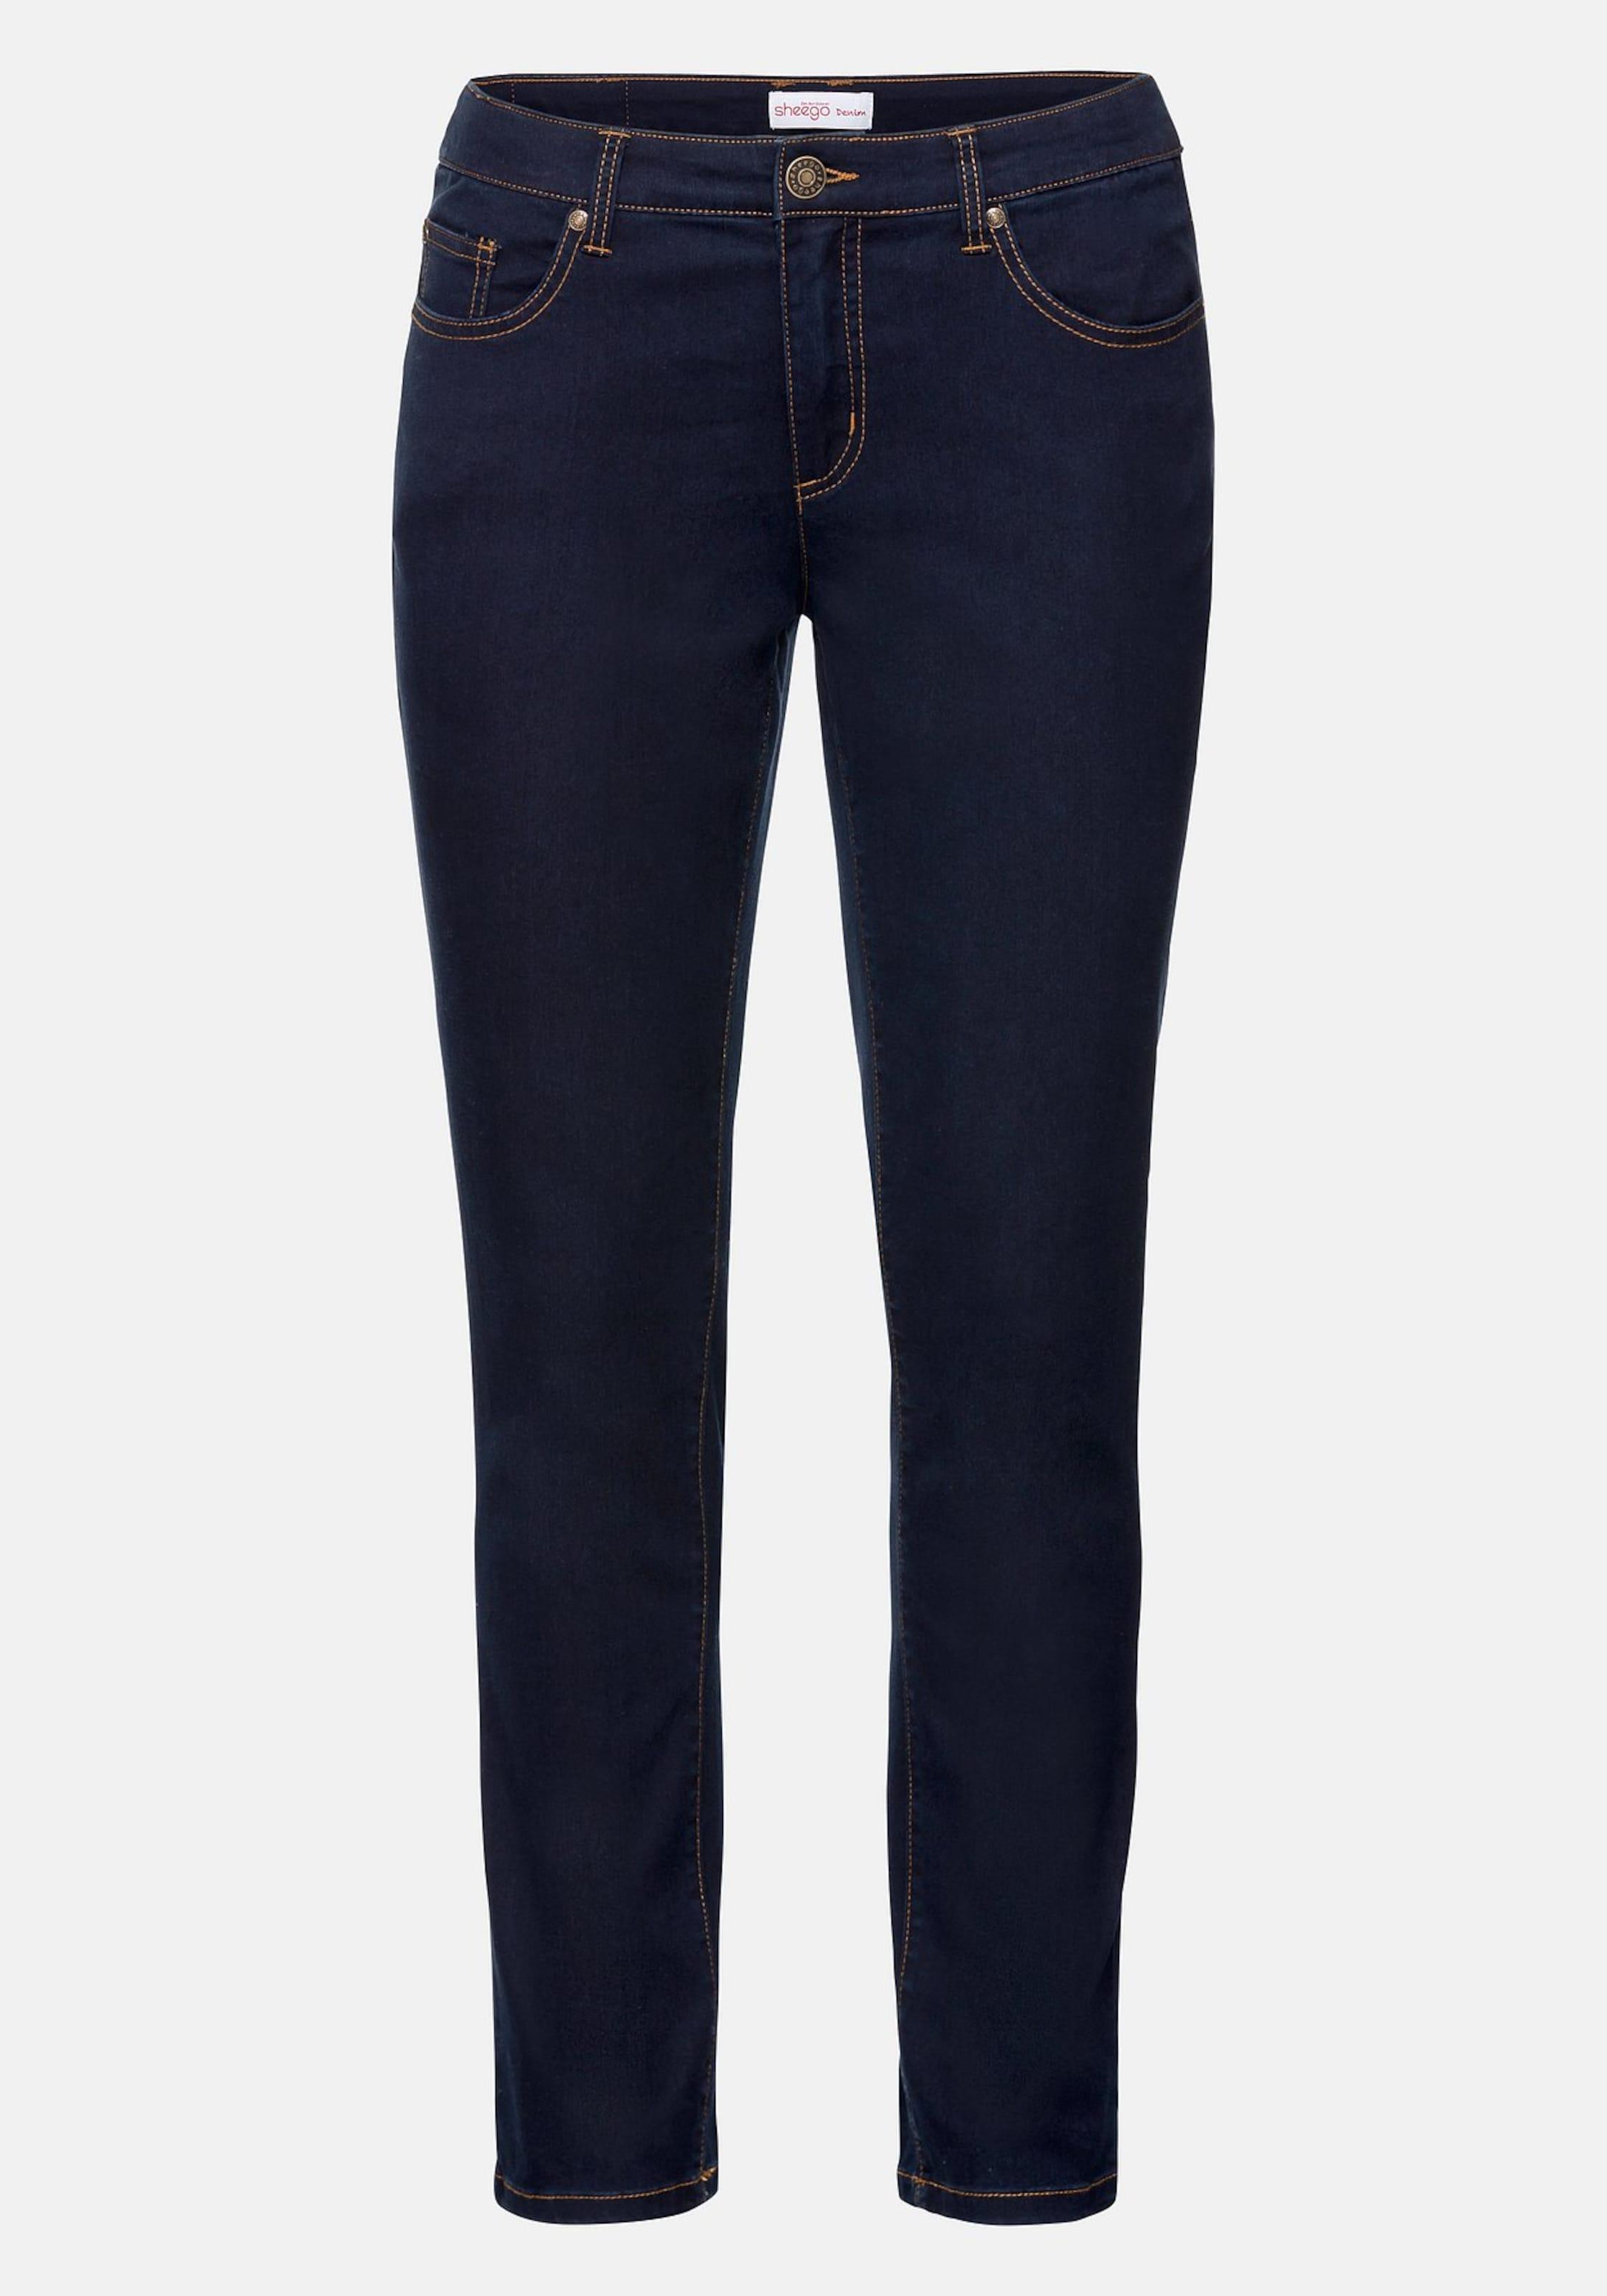 In In Denim Denim Blue Jeans Sheego Sheego Jeans SMVUzp